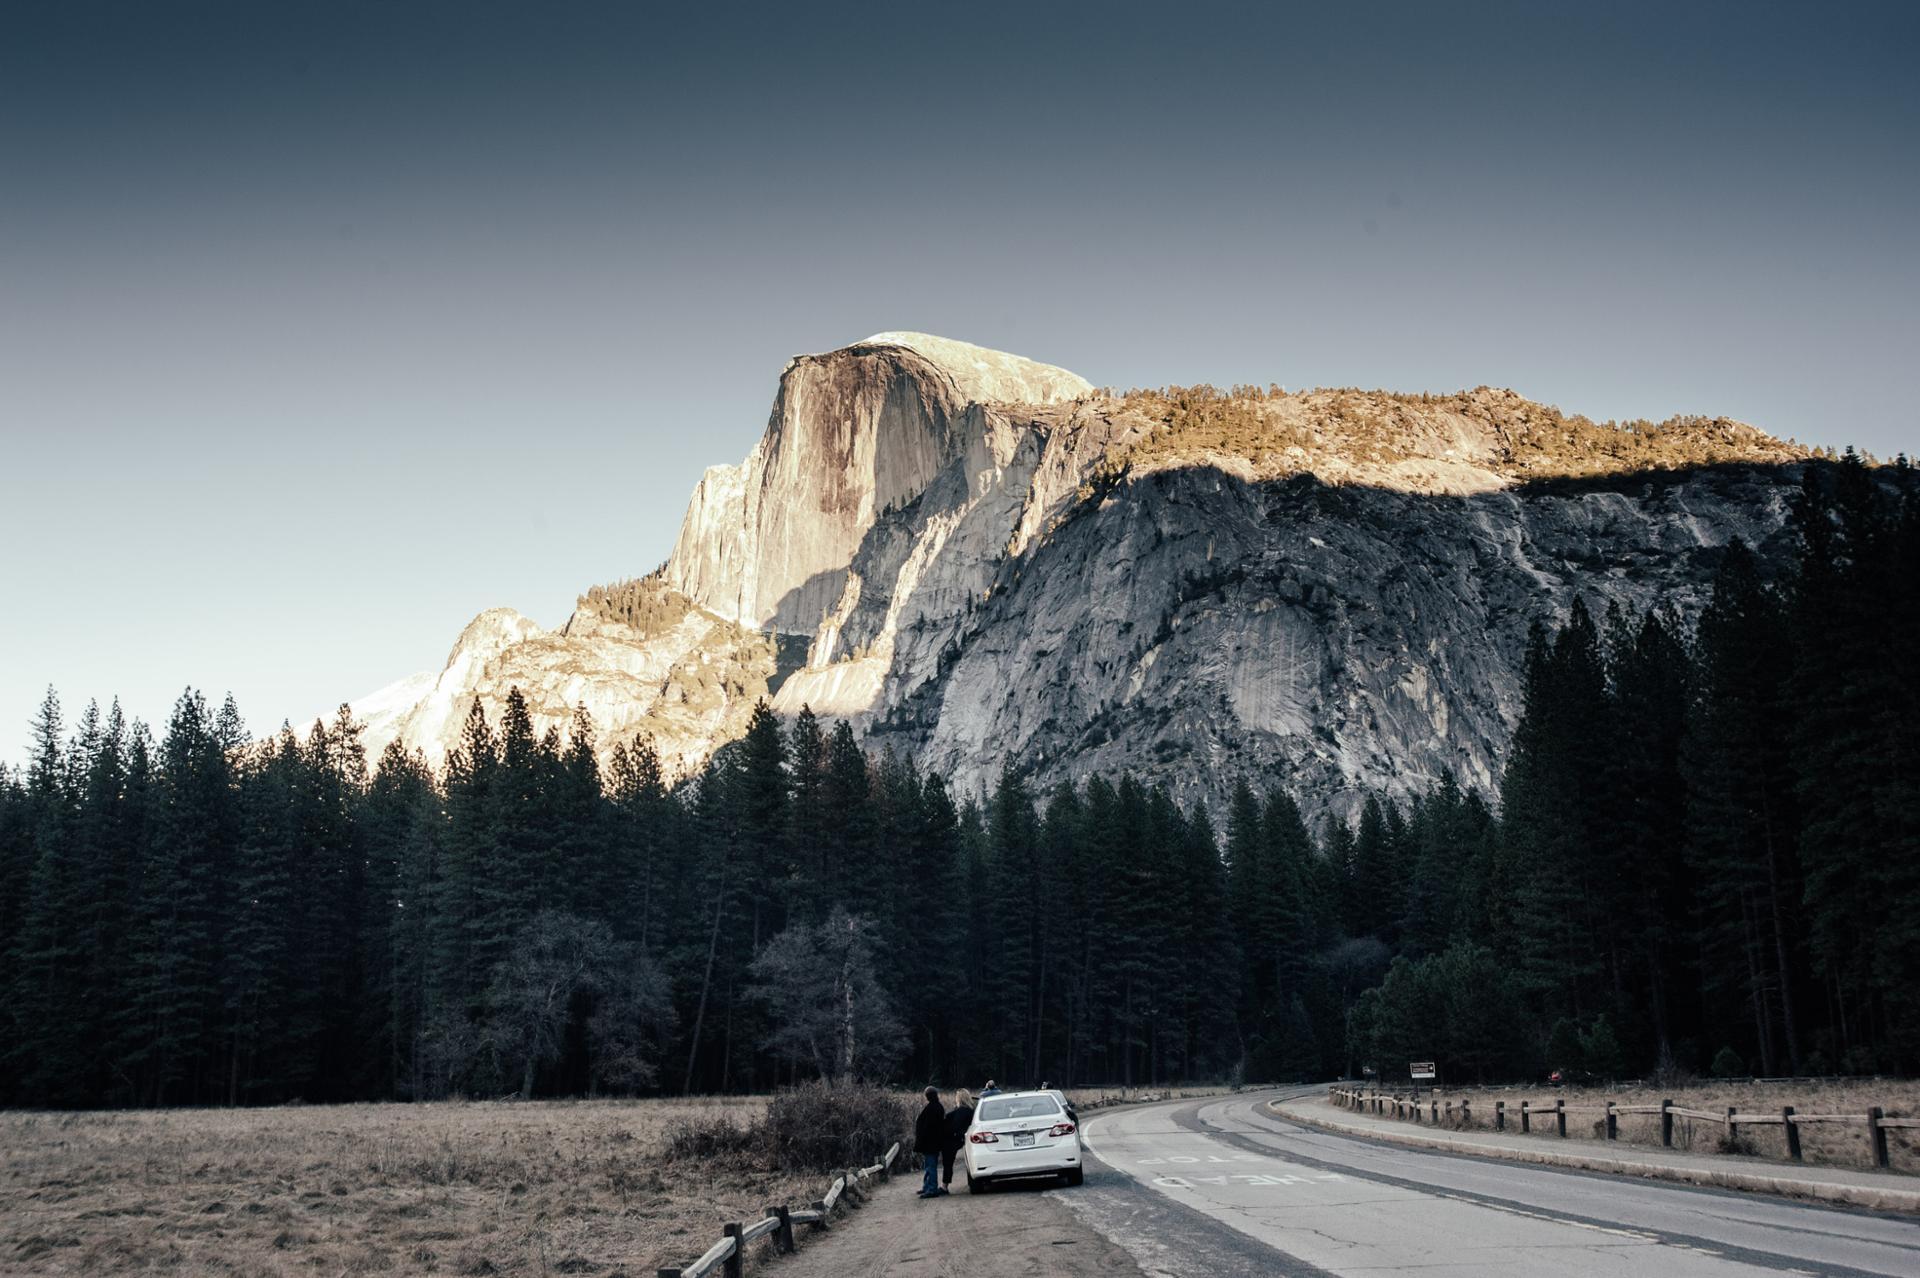 El Capitain, Yosemite